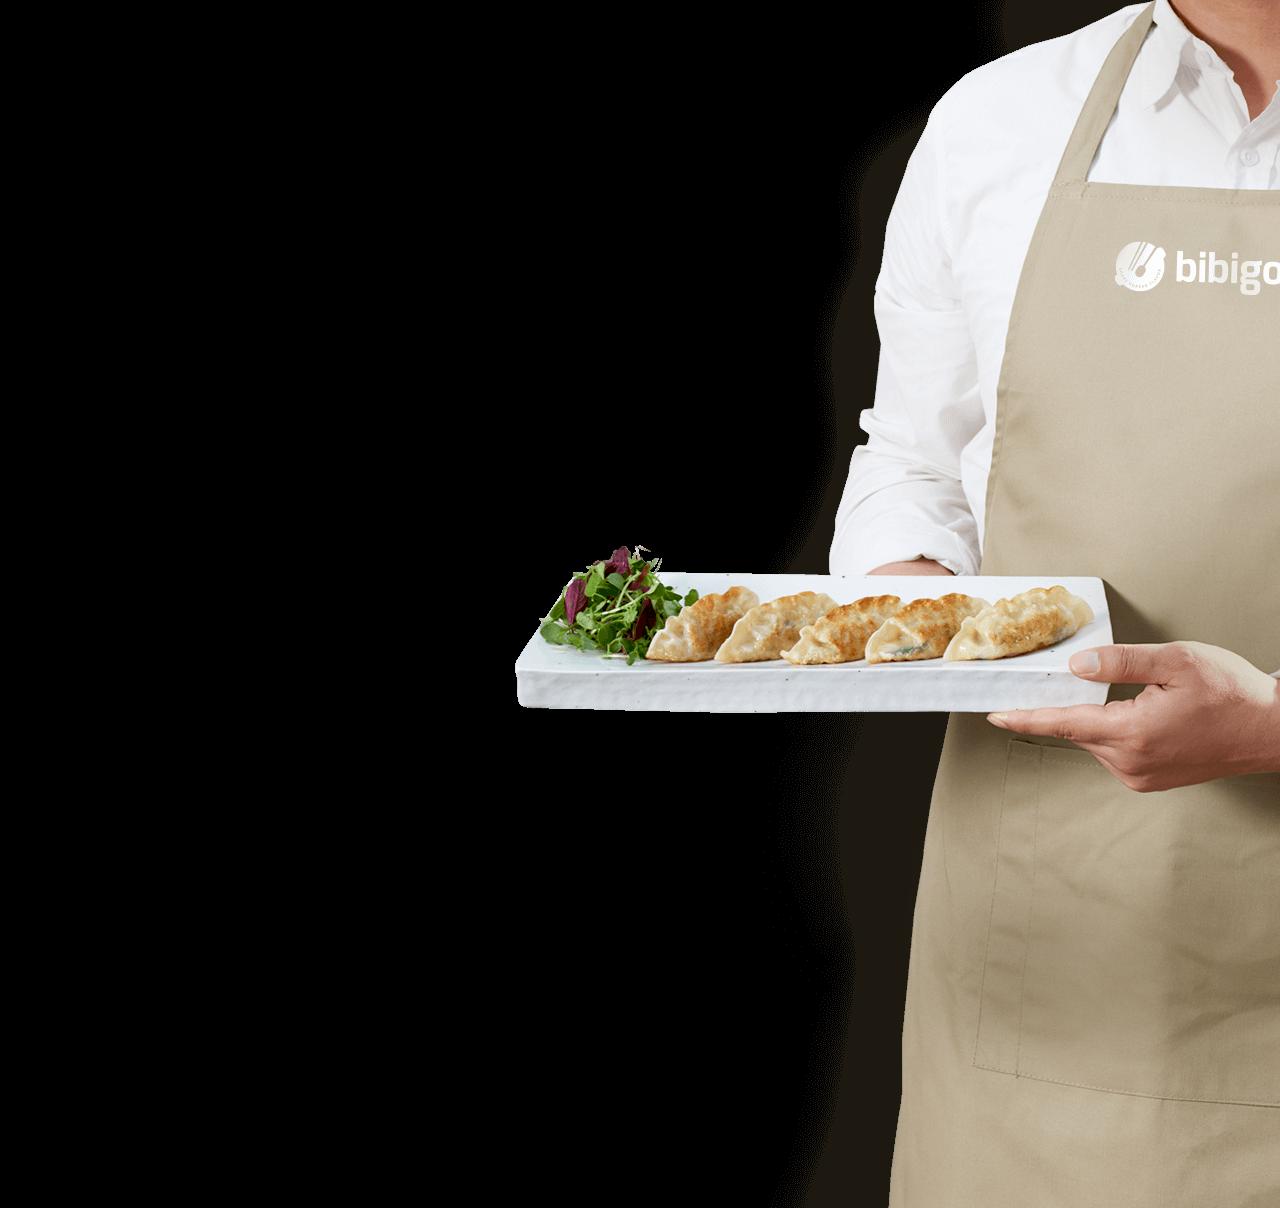 Dumpling Soup Woolworths Languageen: Korean Cuisine Brand